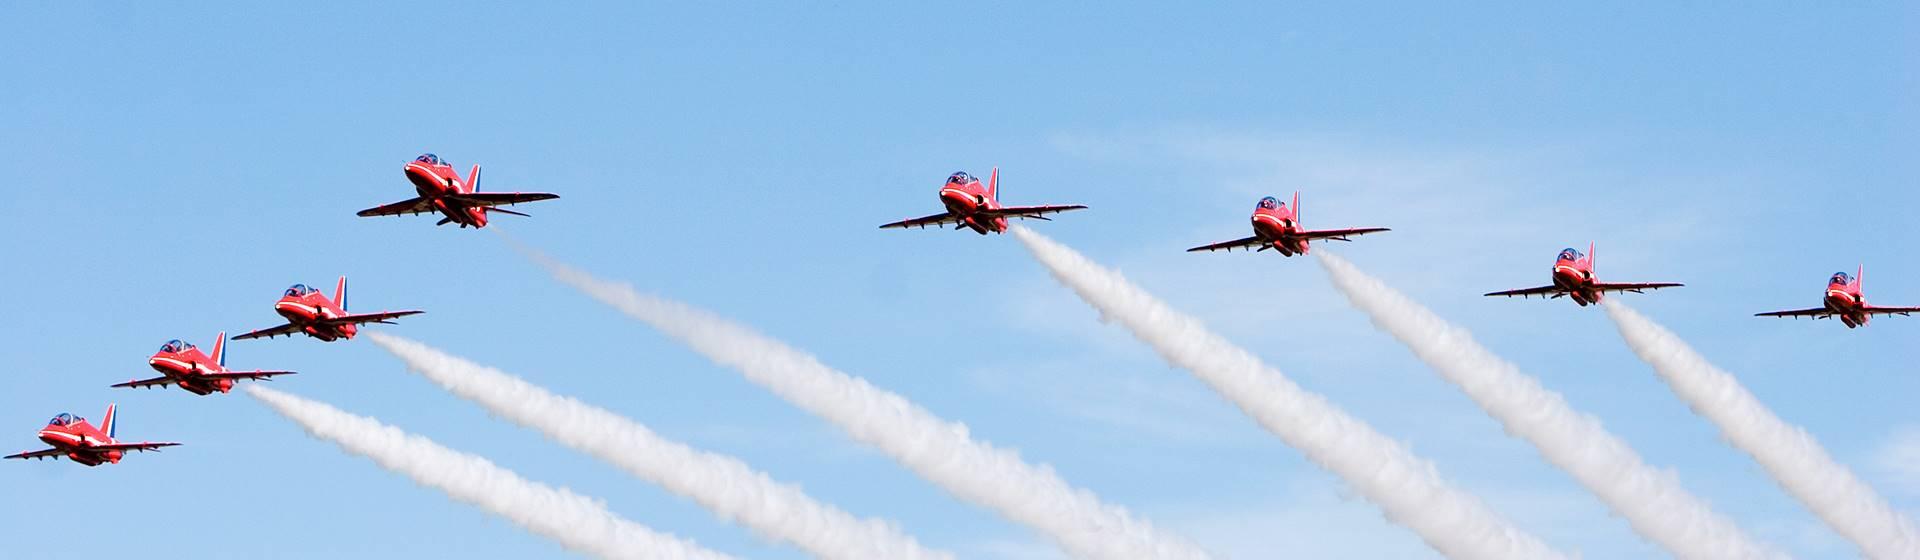 Bournemouth Annual Summer Air Festival Weekend